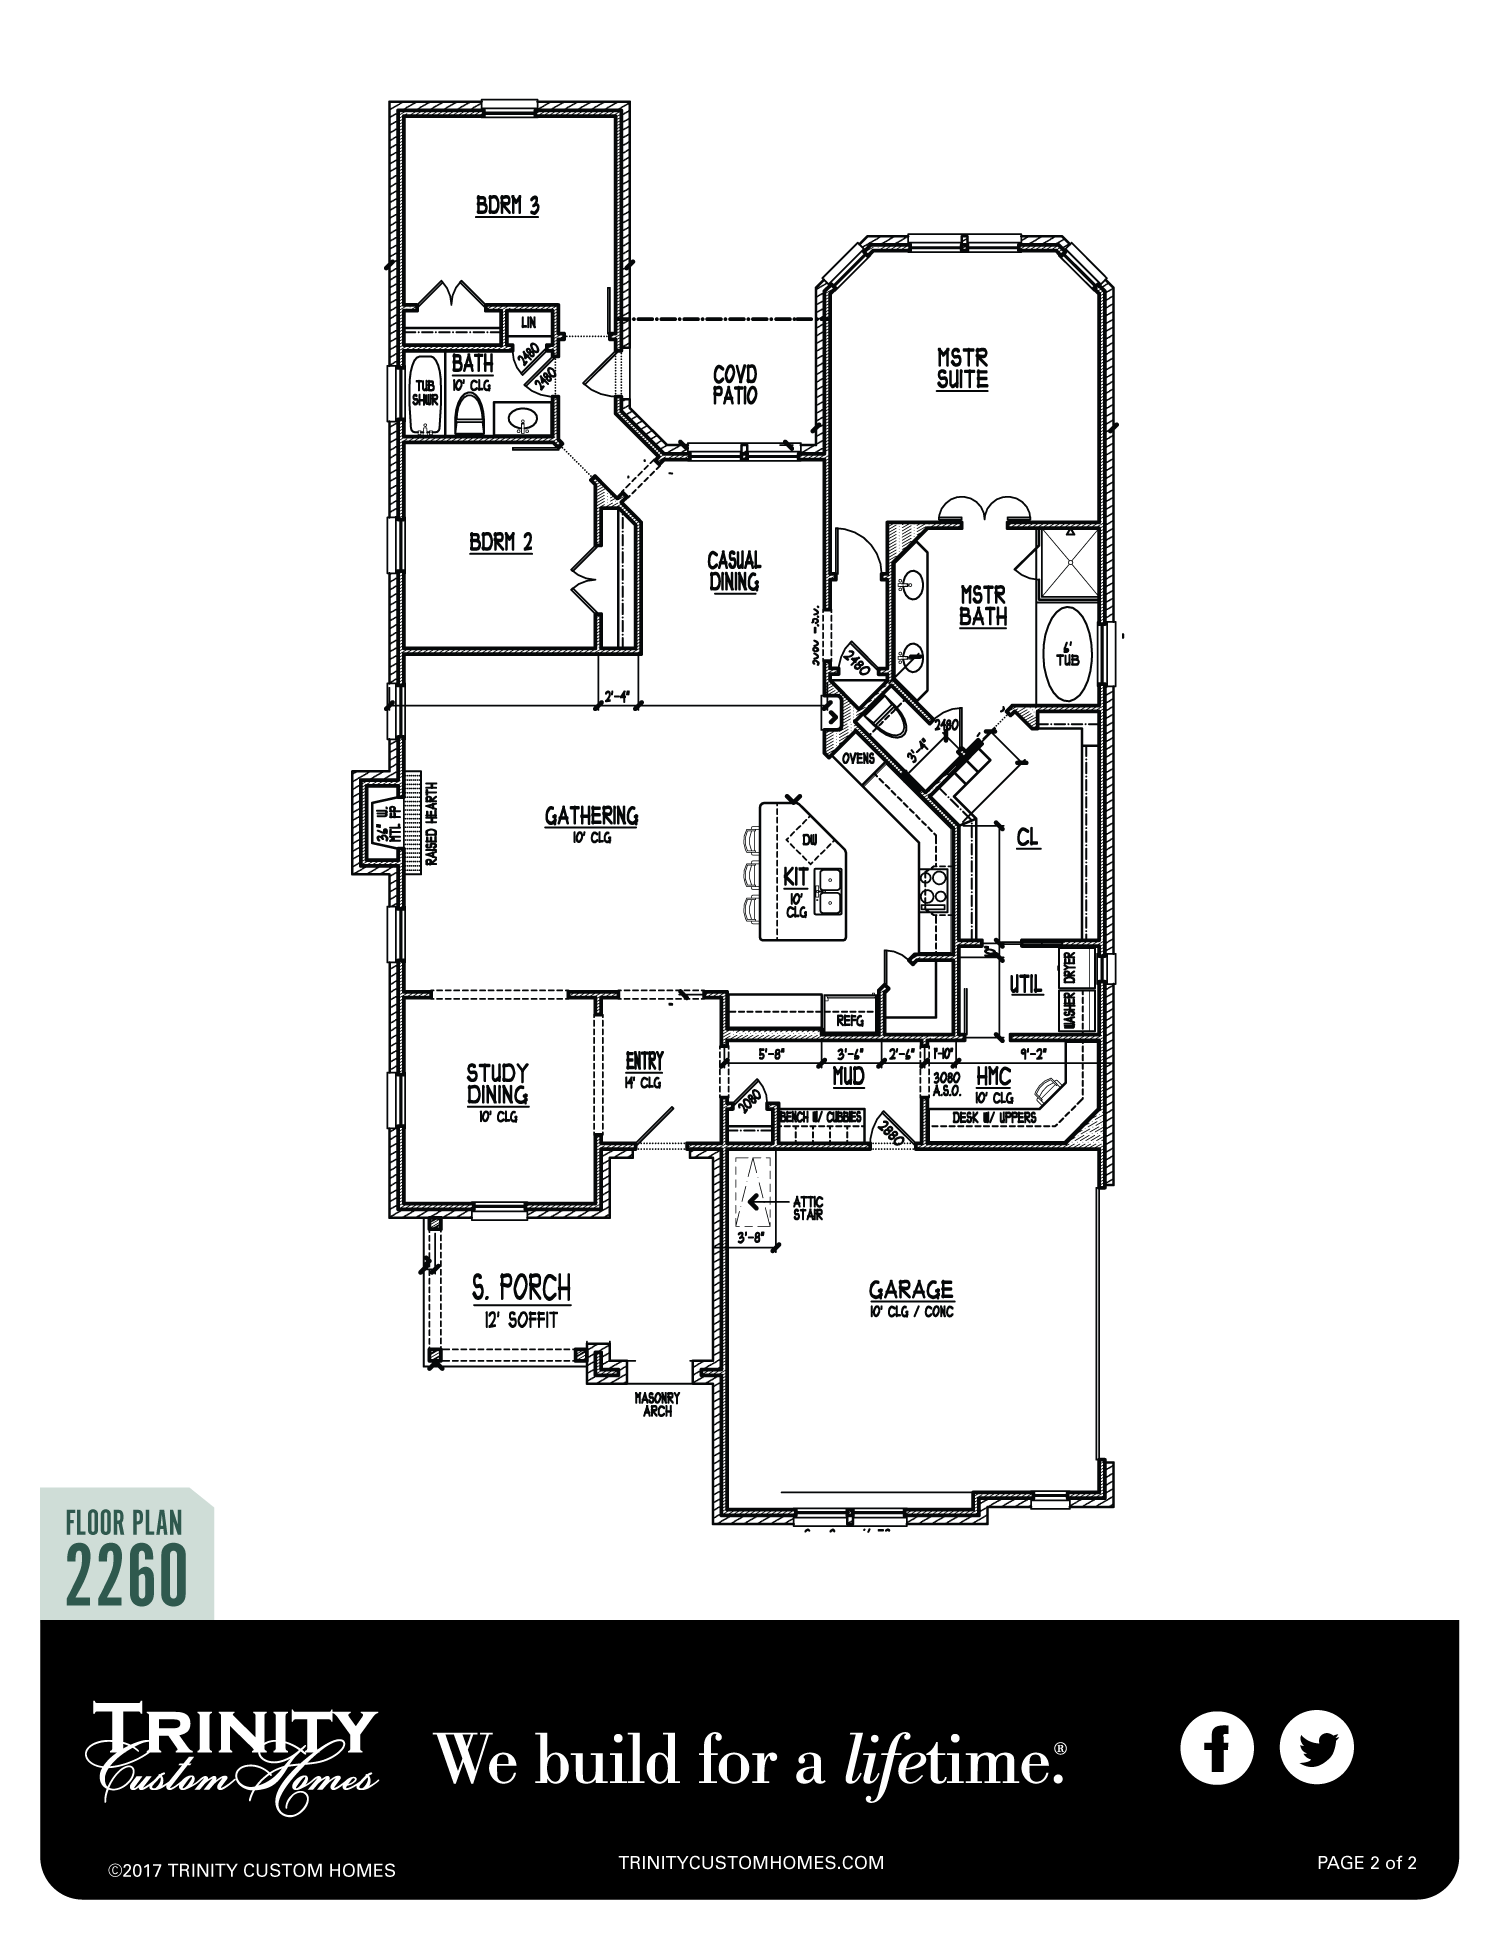 FloorPlan2260